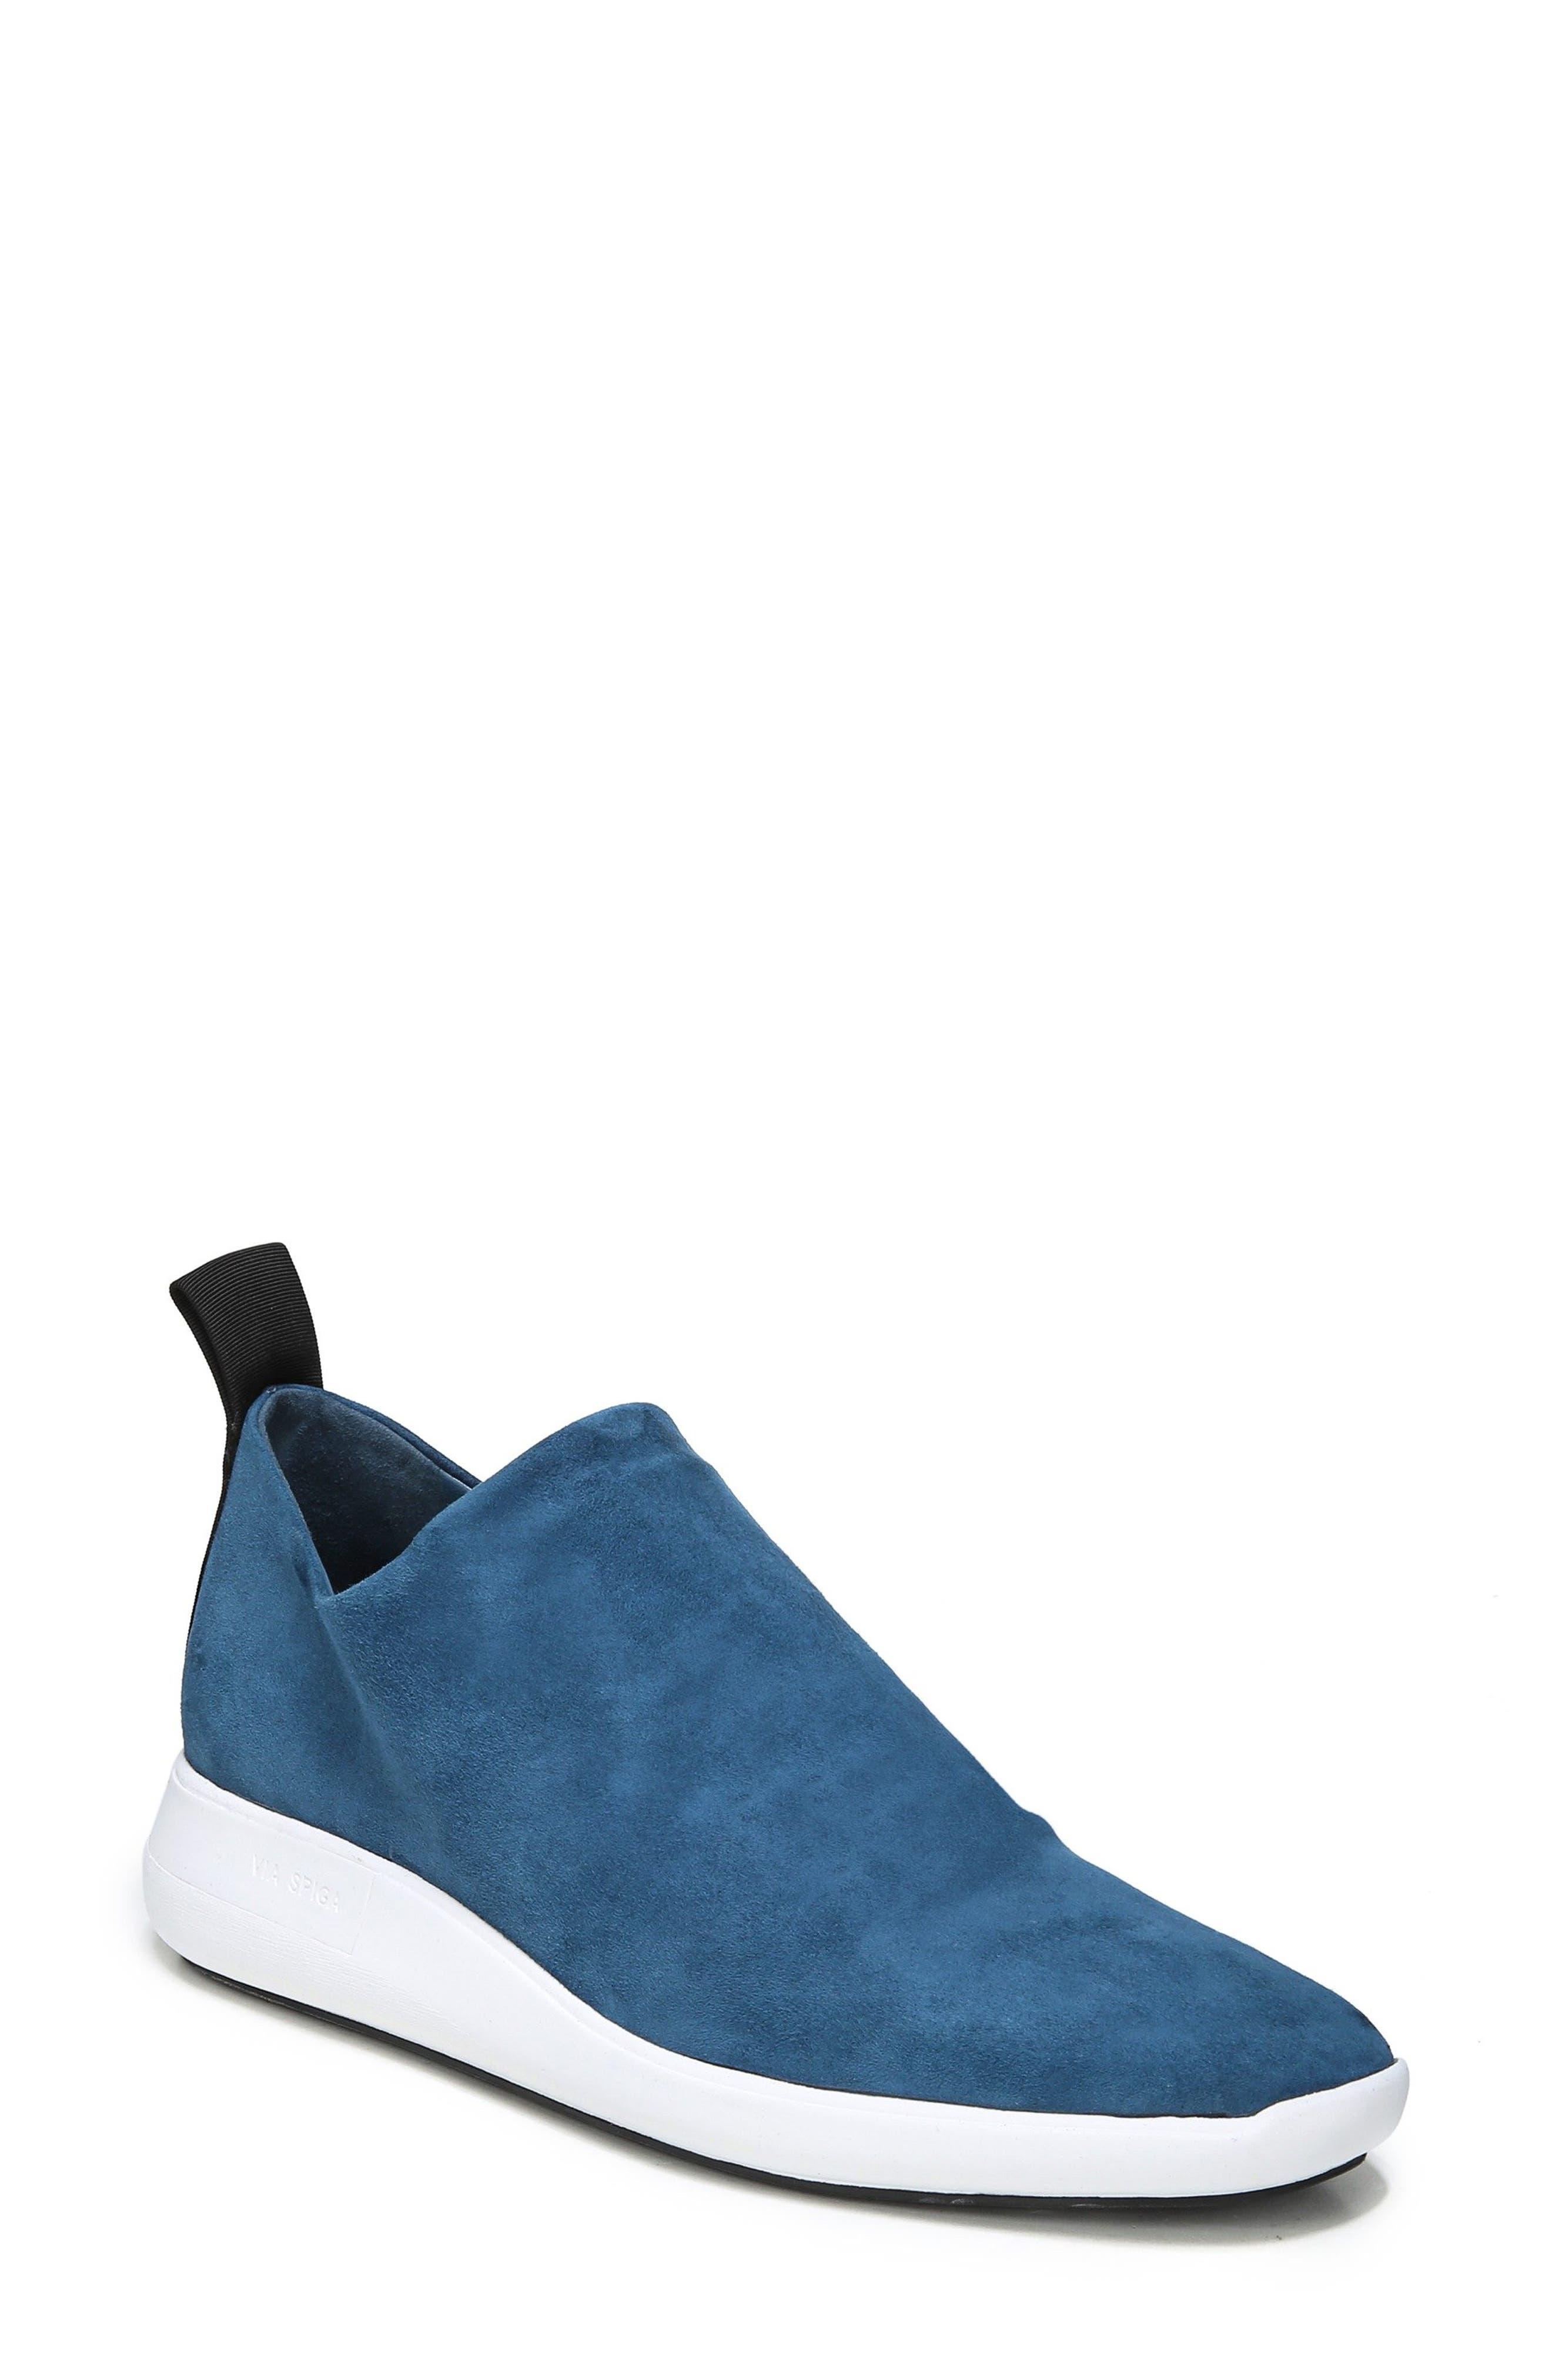 Marlow Slip-On Sneaker,                             Main thumbnail 2, color,